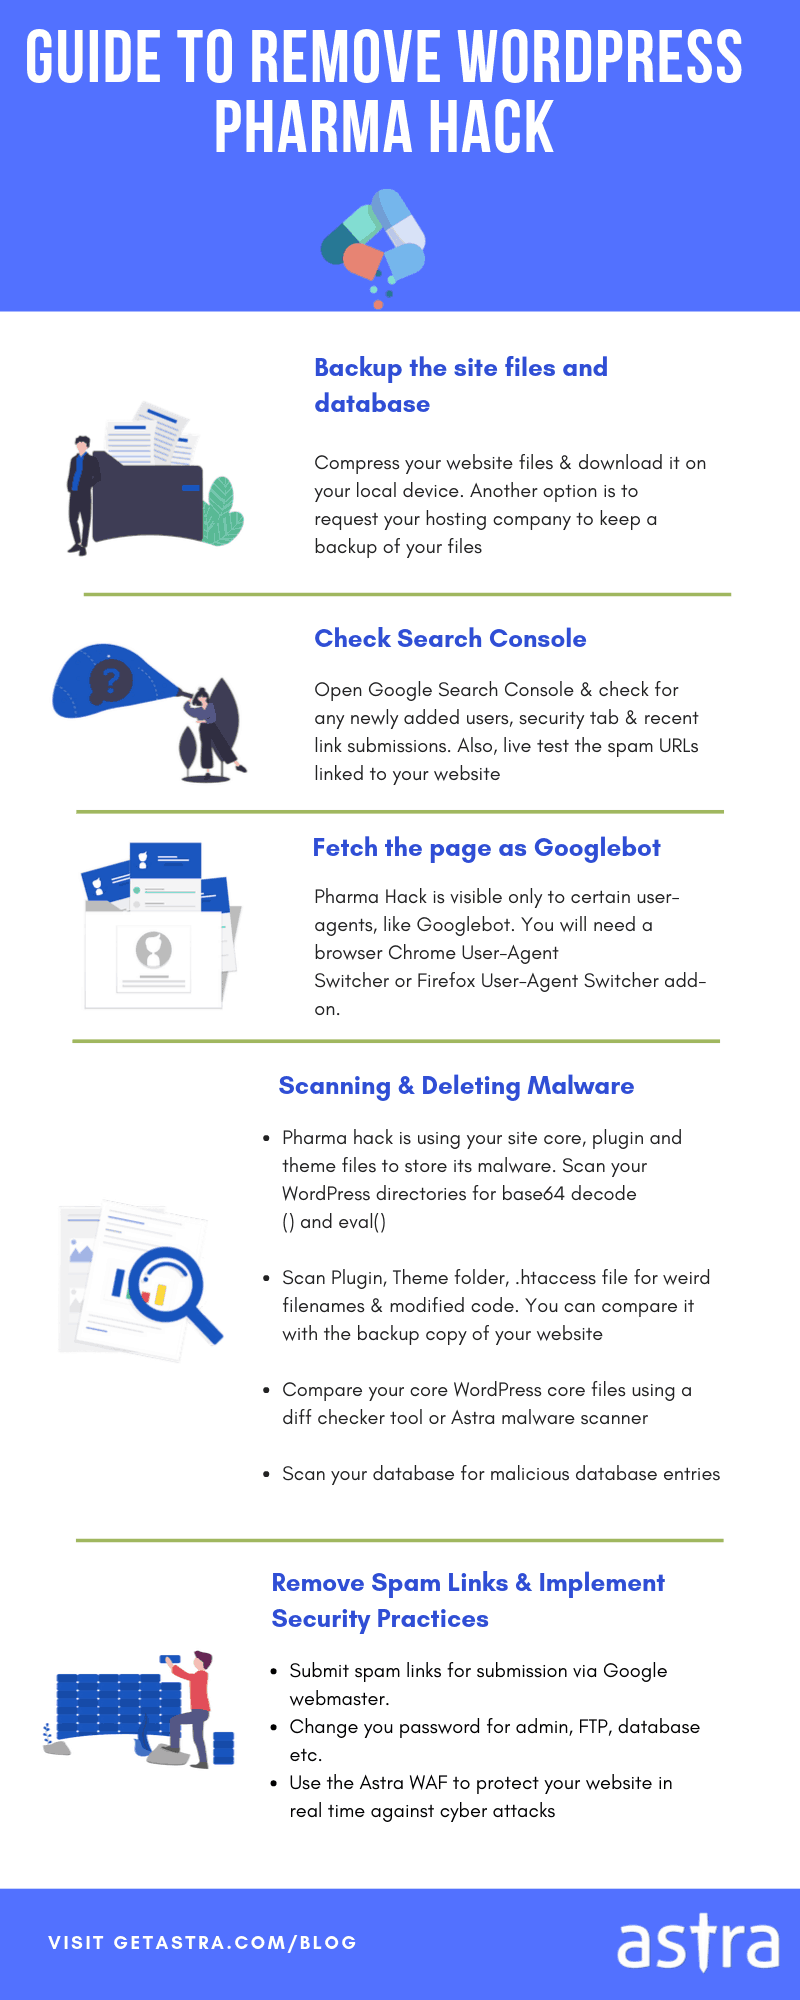 Guide to Remove WordPress Pharma Hack